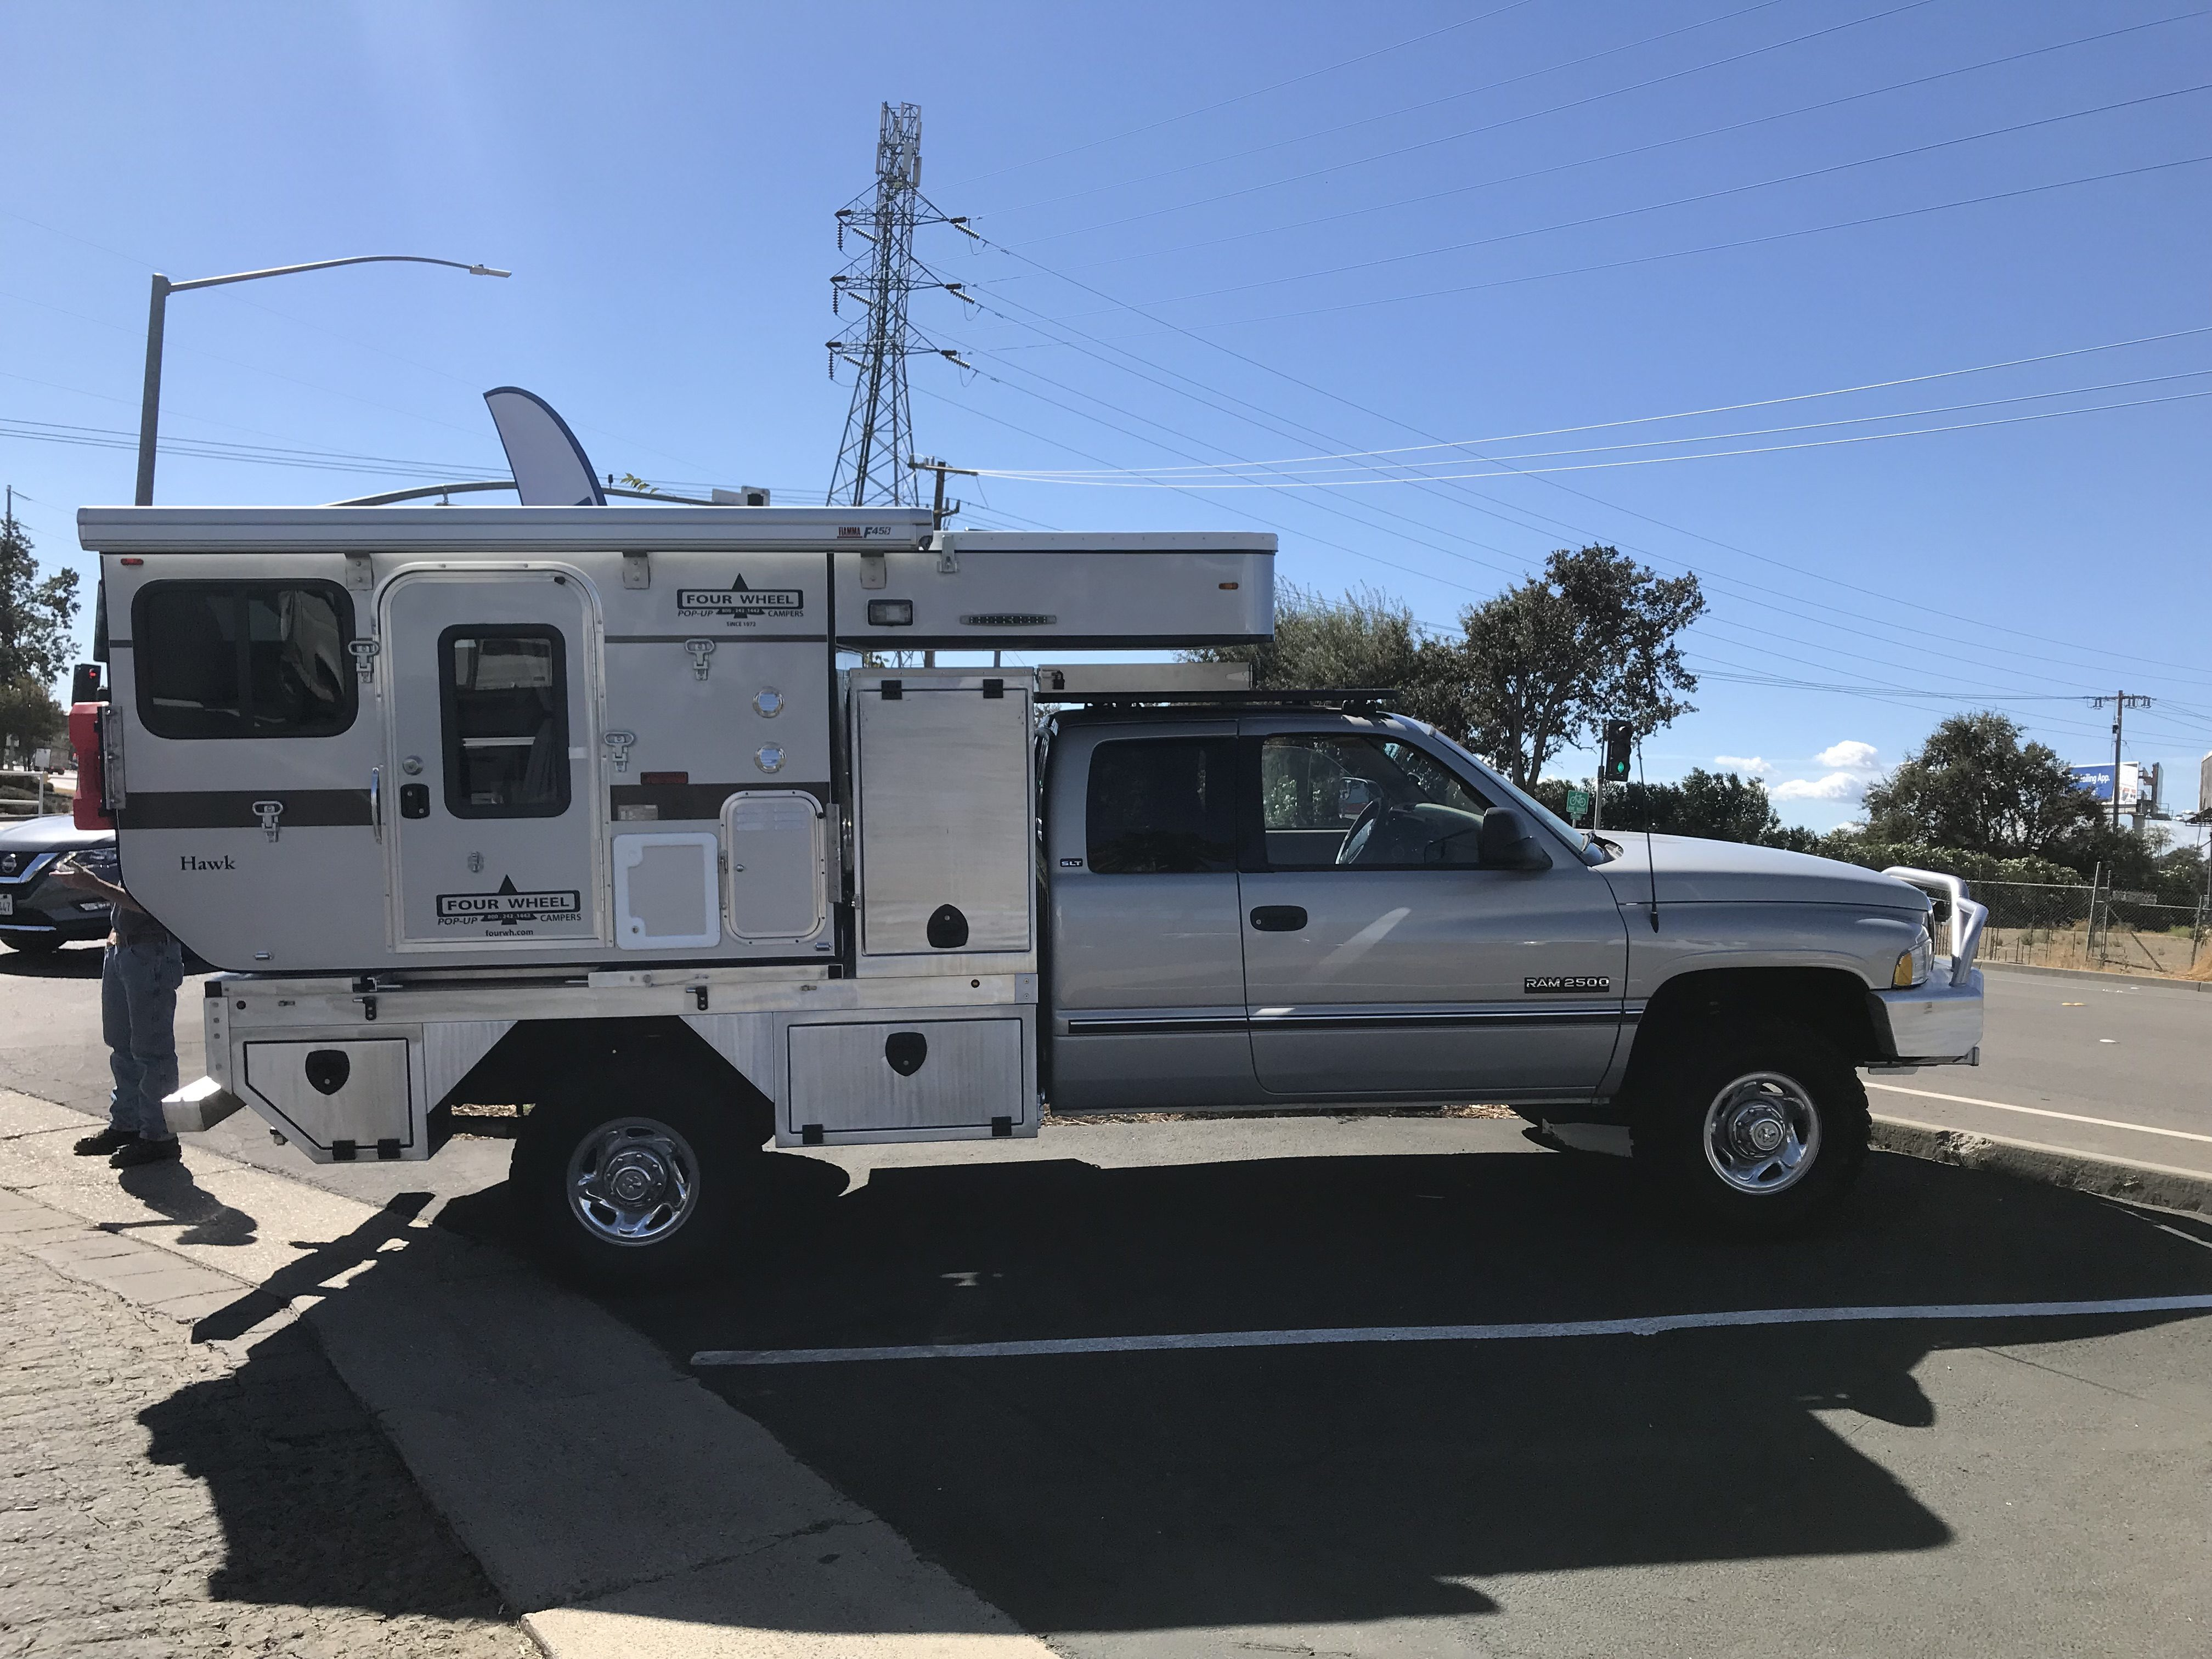 Four Wheel Campers - storage